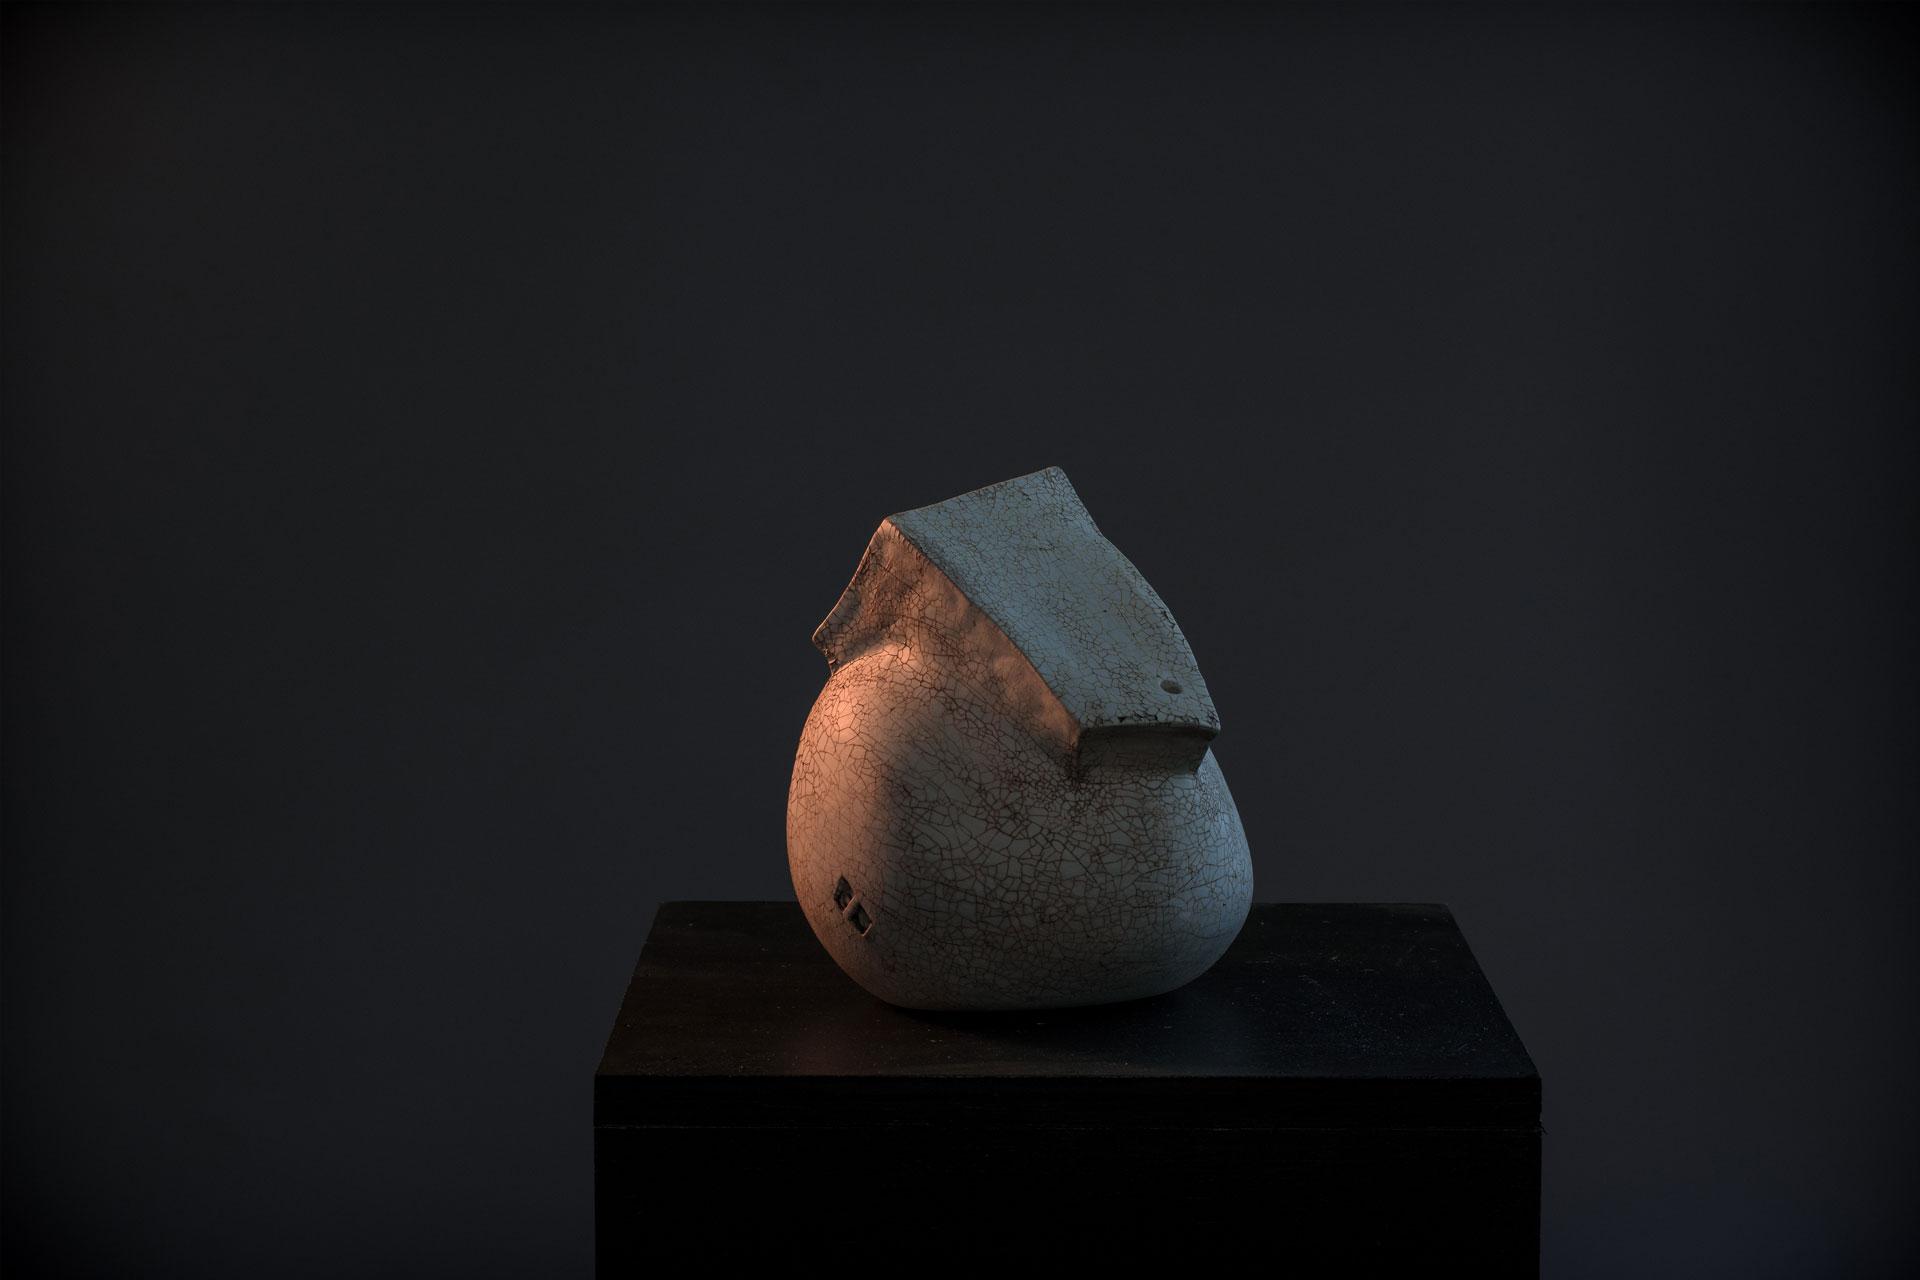 gallery-101-seung-jun-seo-ceramics-artist-asheville-north-carolina-4.jpg